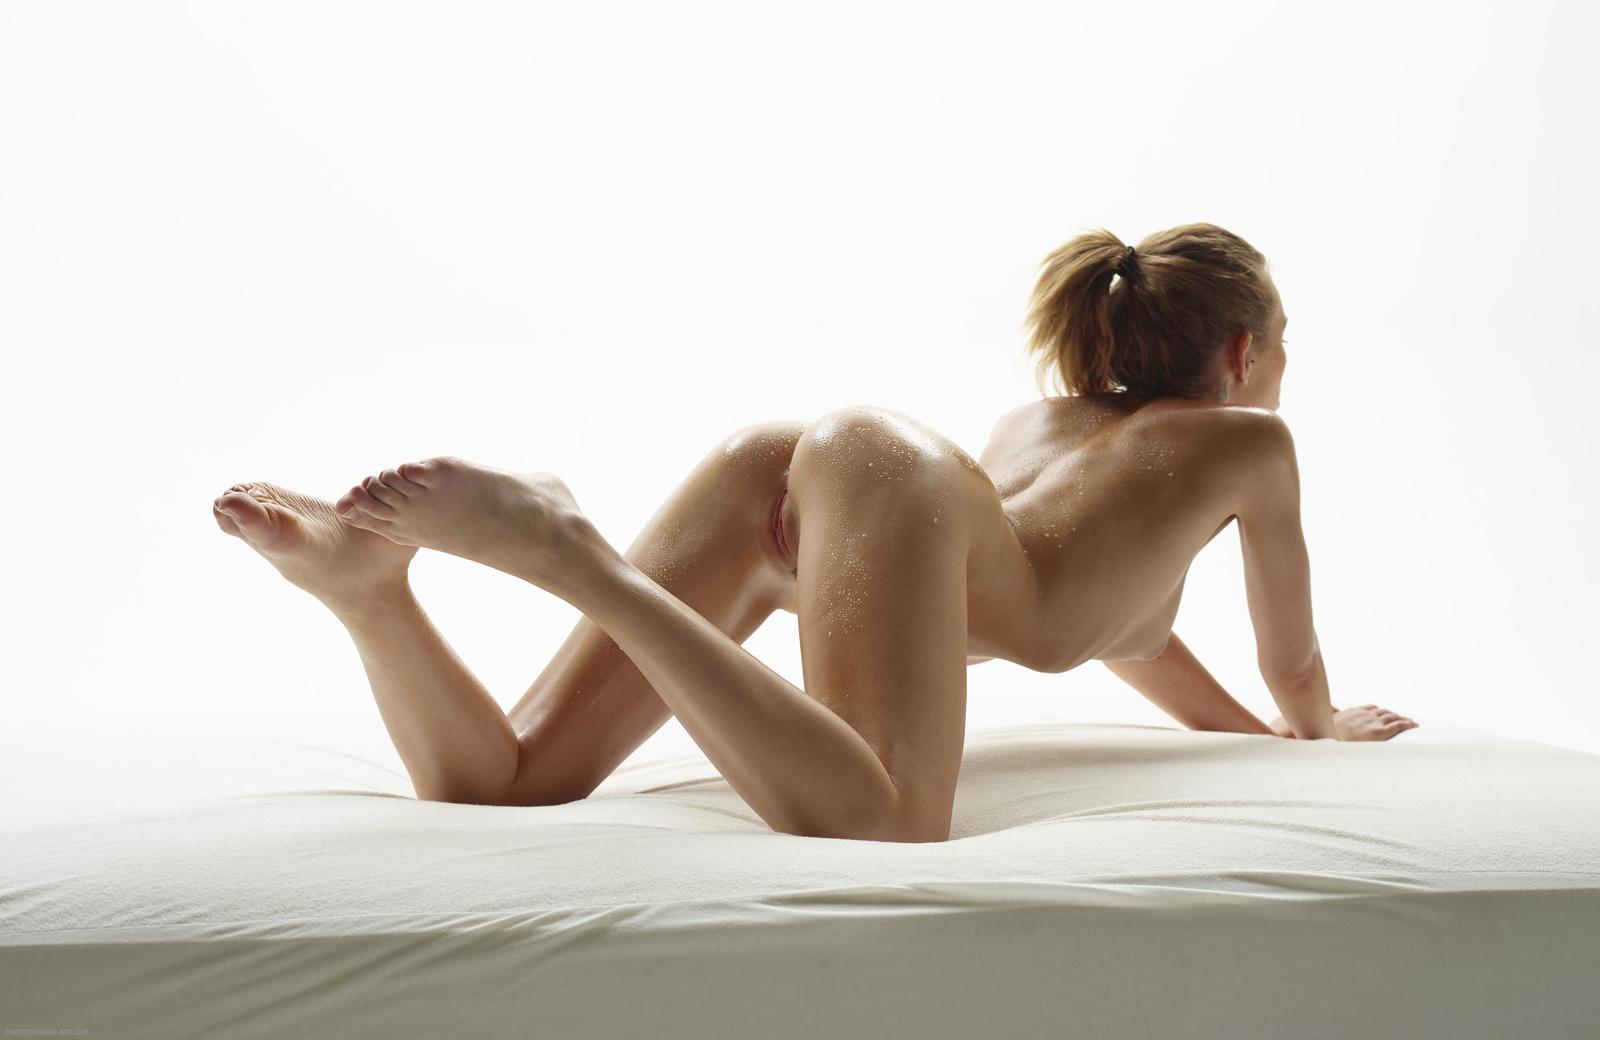 Erotic Art Photos